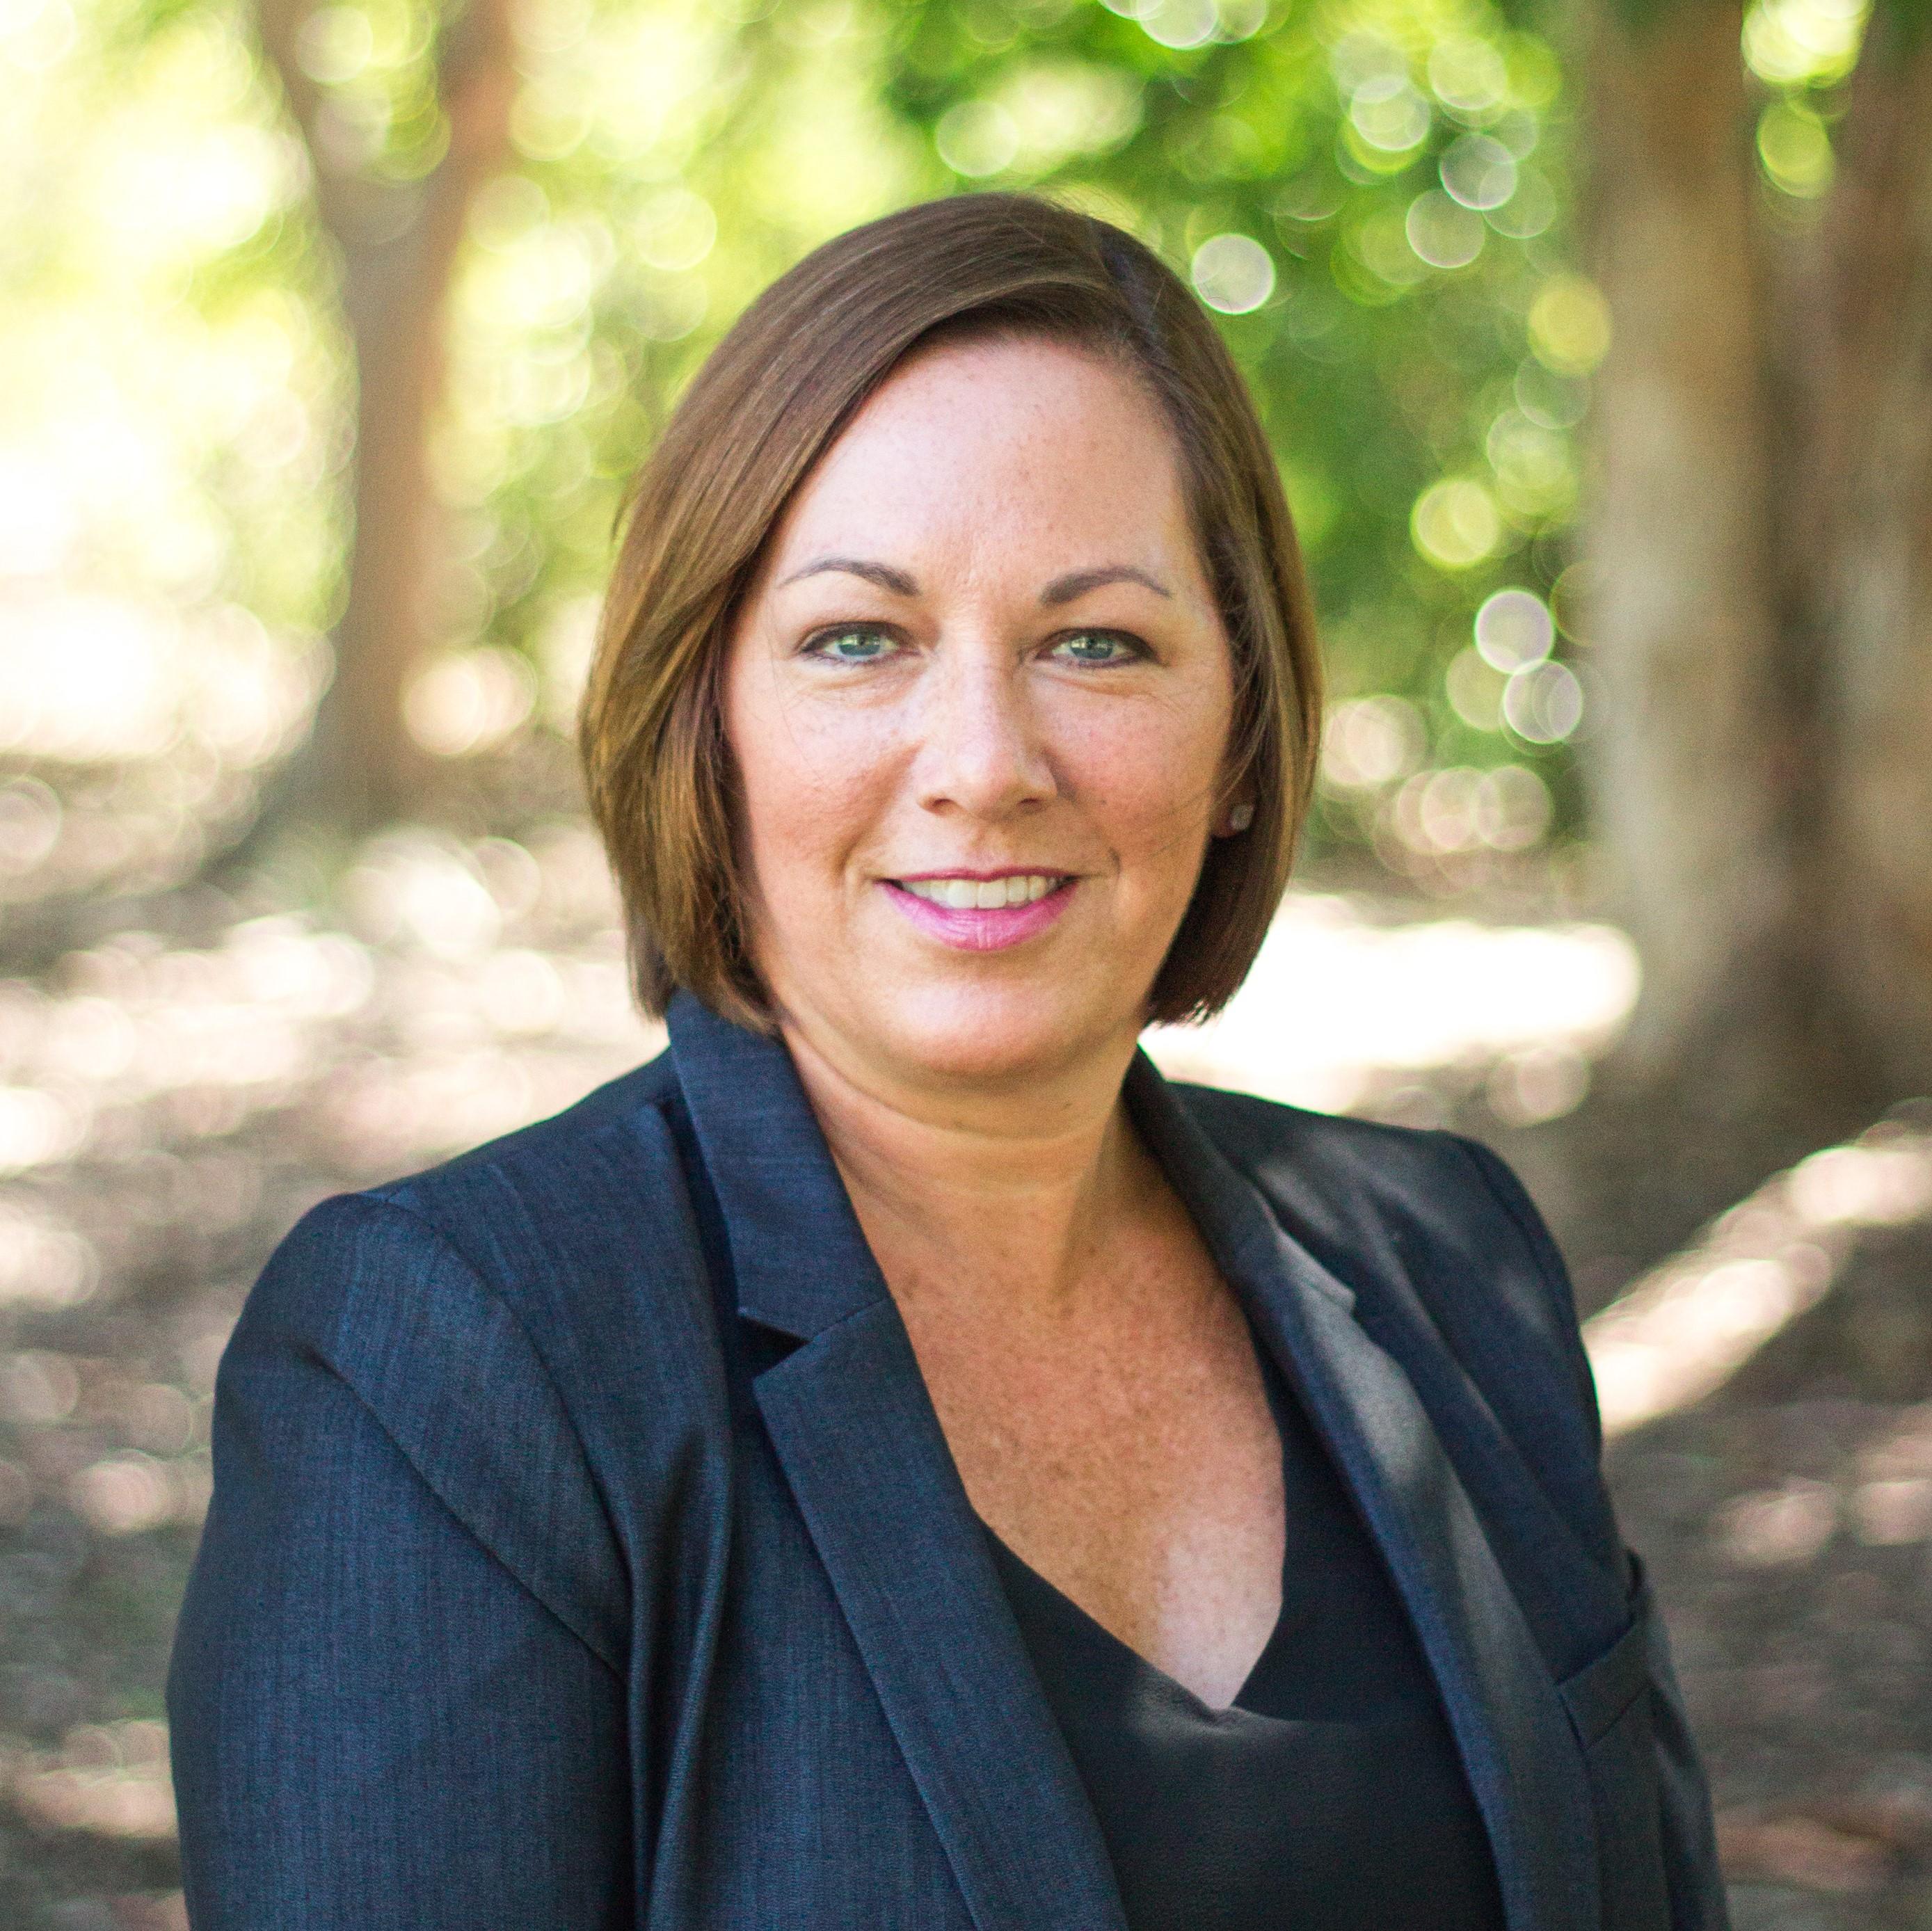 Jennifer Nerat